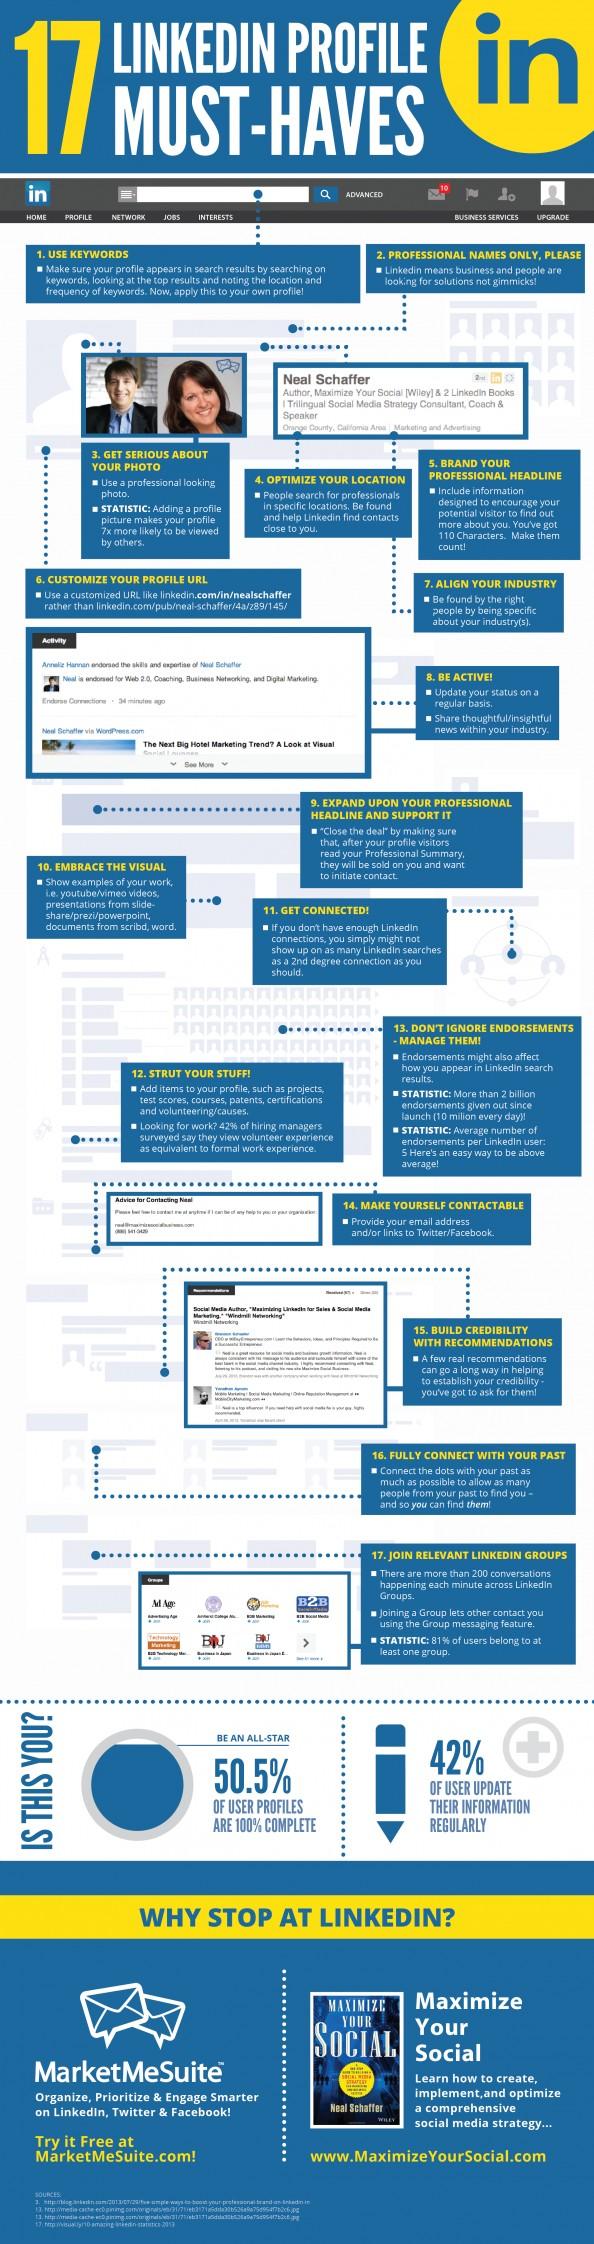 Ultimate LinkedIn Profile Must-Haves